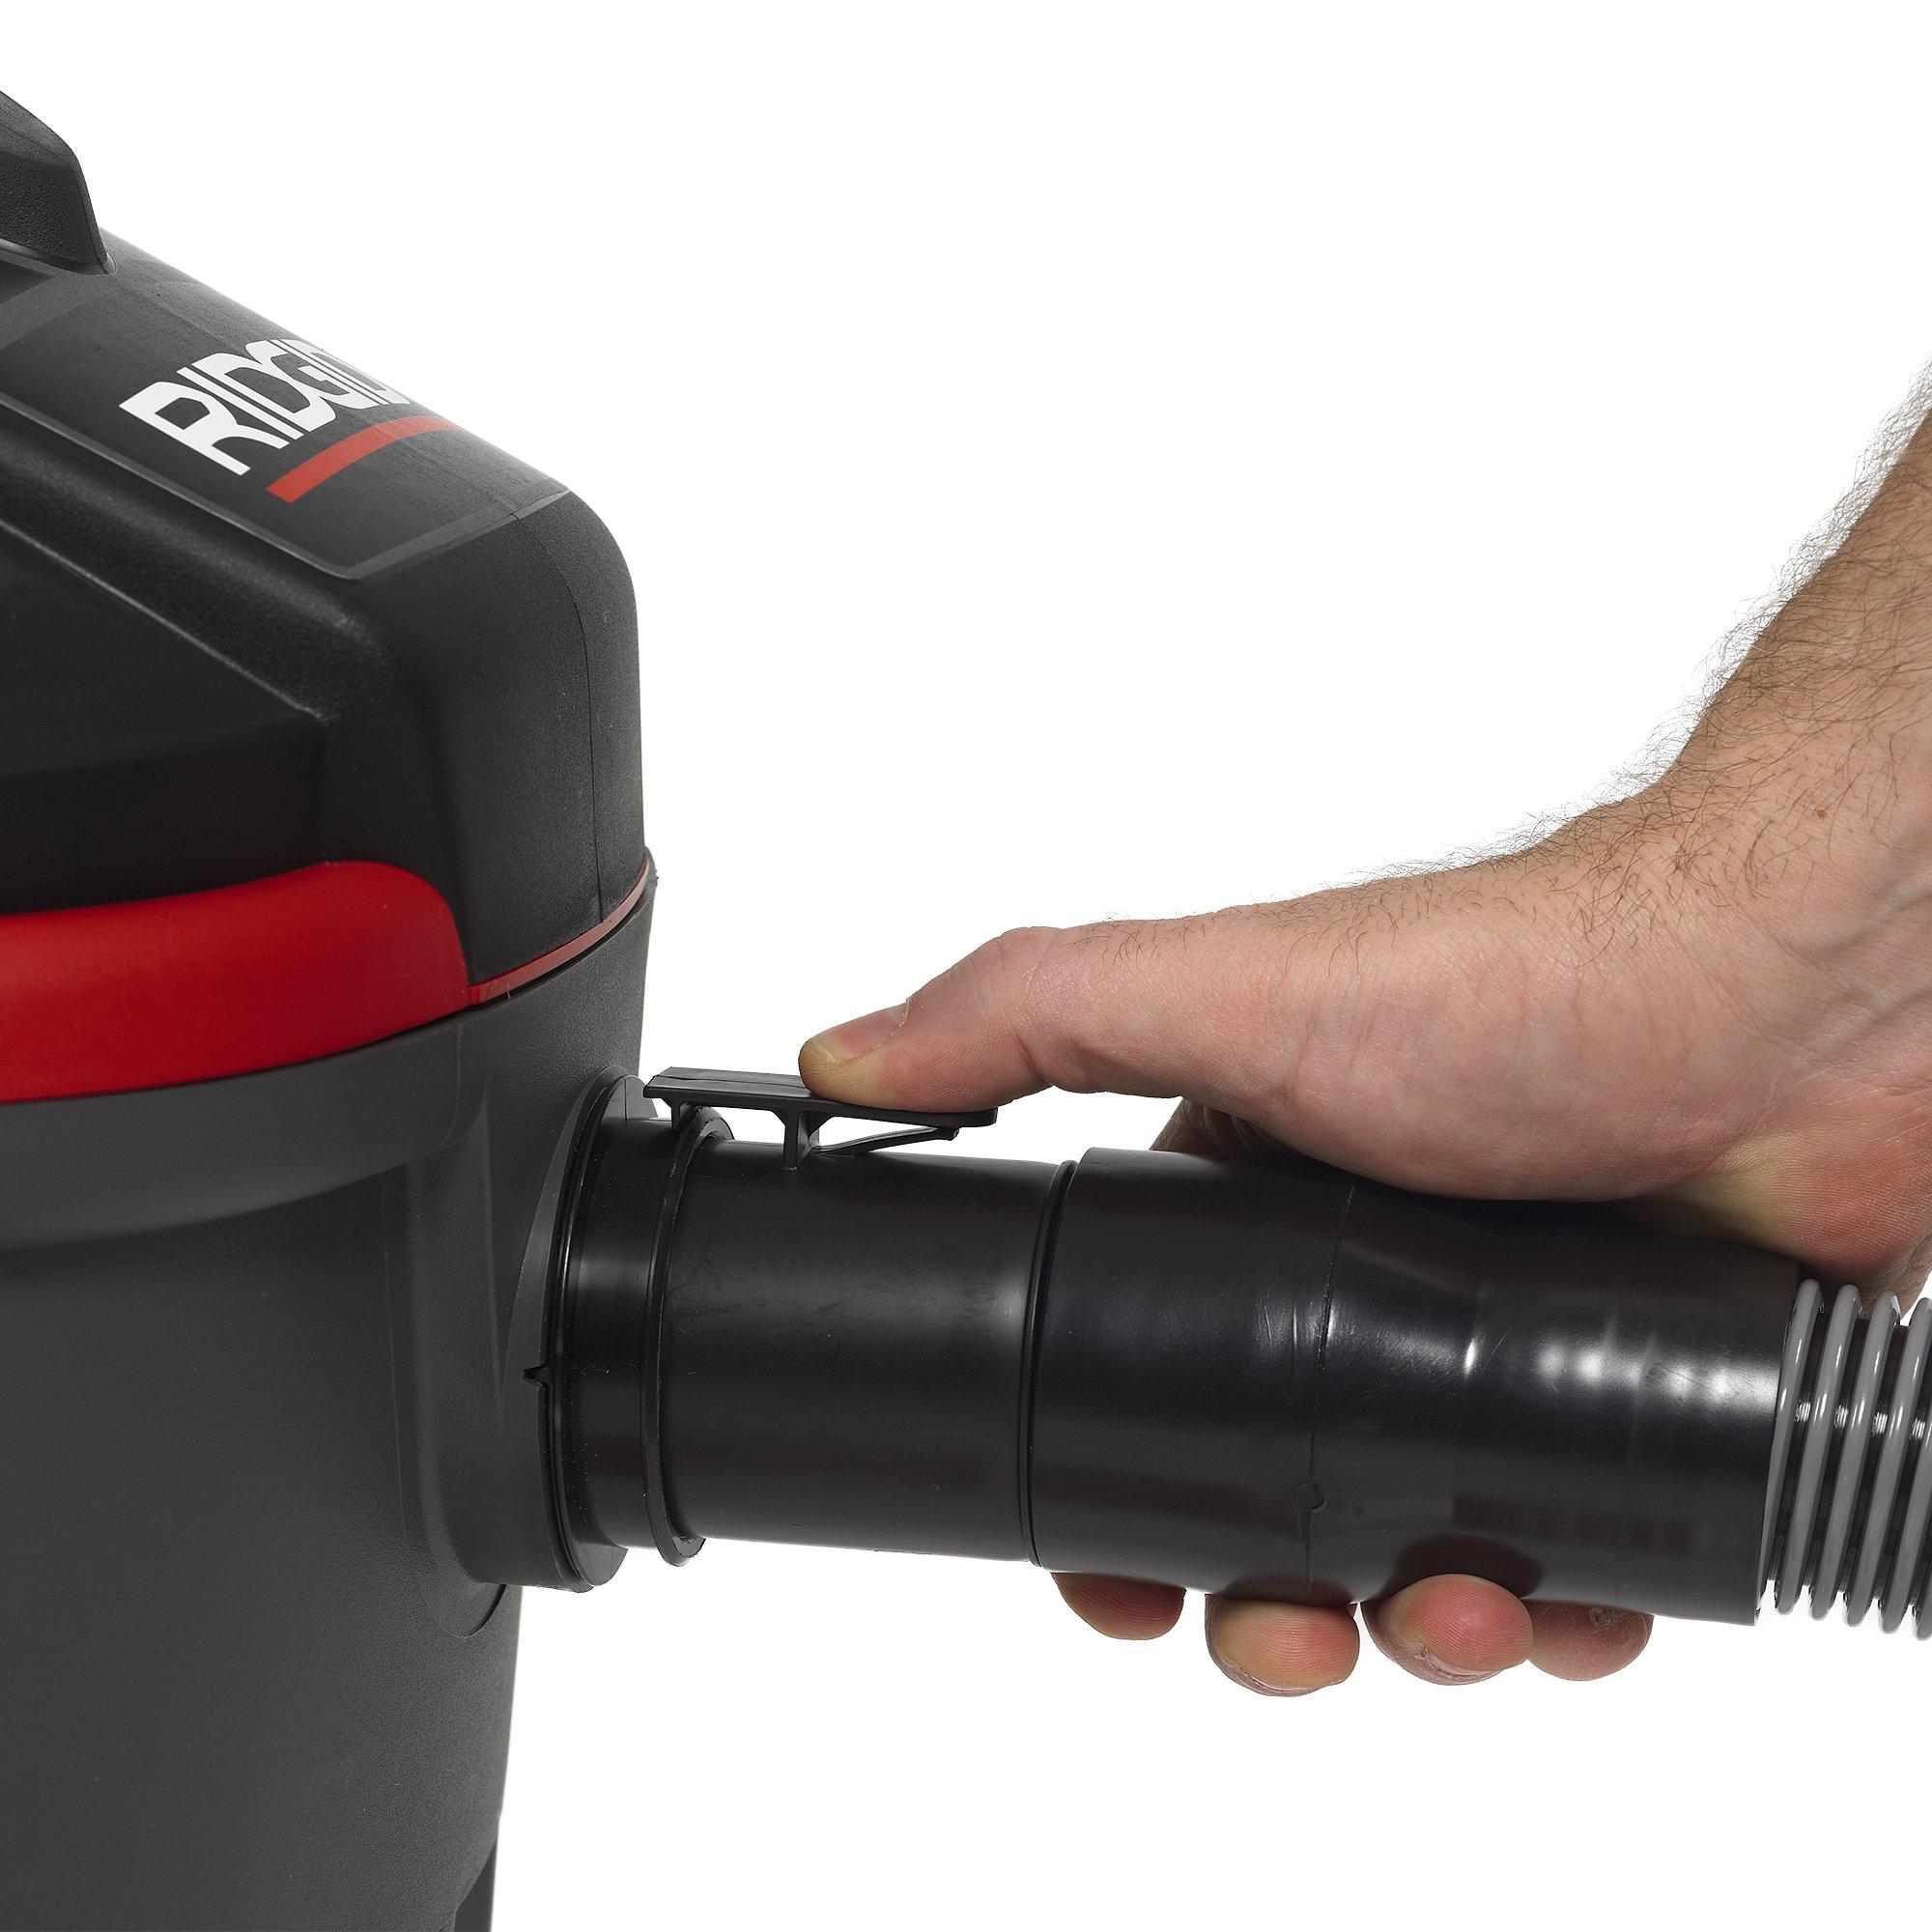 RIDGID 50313 4000RV Portable Wet Dry Vacuum, 4-Gallon Small Wet Dry Vac with 5.0 Peak HP Motor, Pro Hose, Ergonomic Handle, Cord Wrap, Blower Port by Ridgid (Image #8)